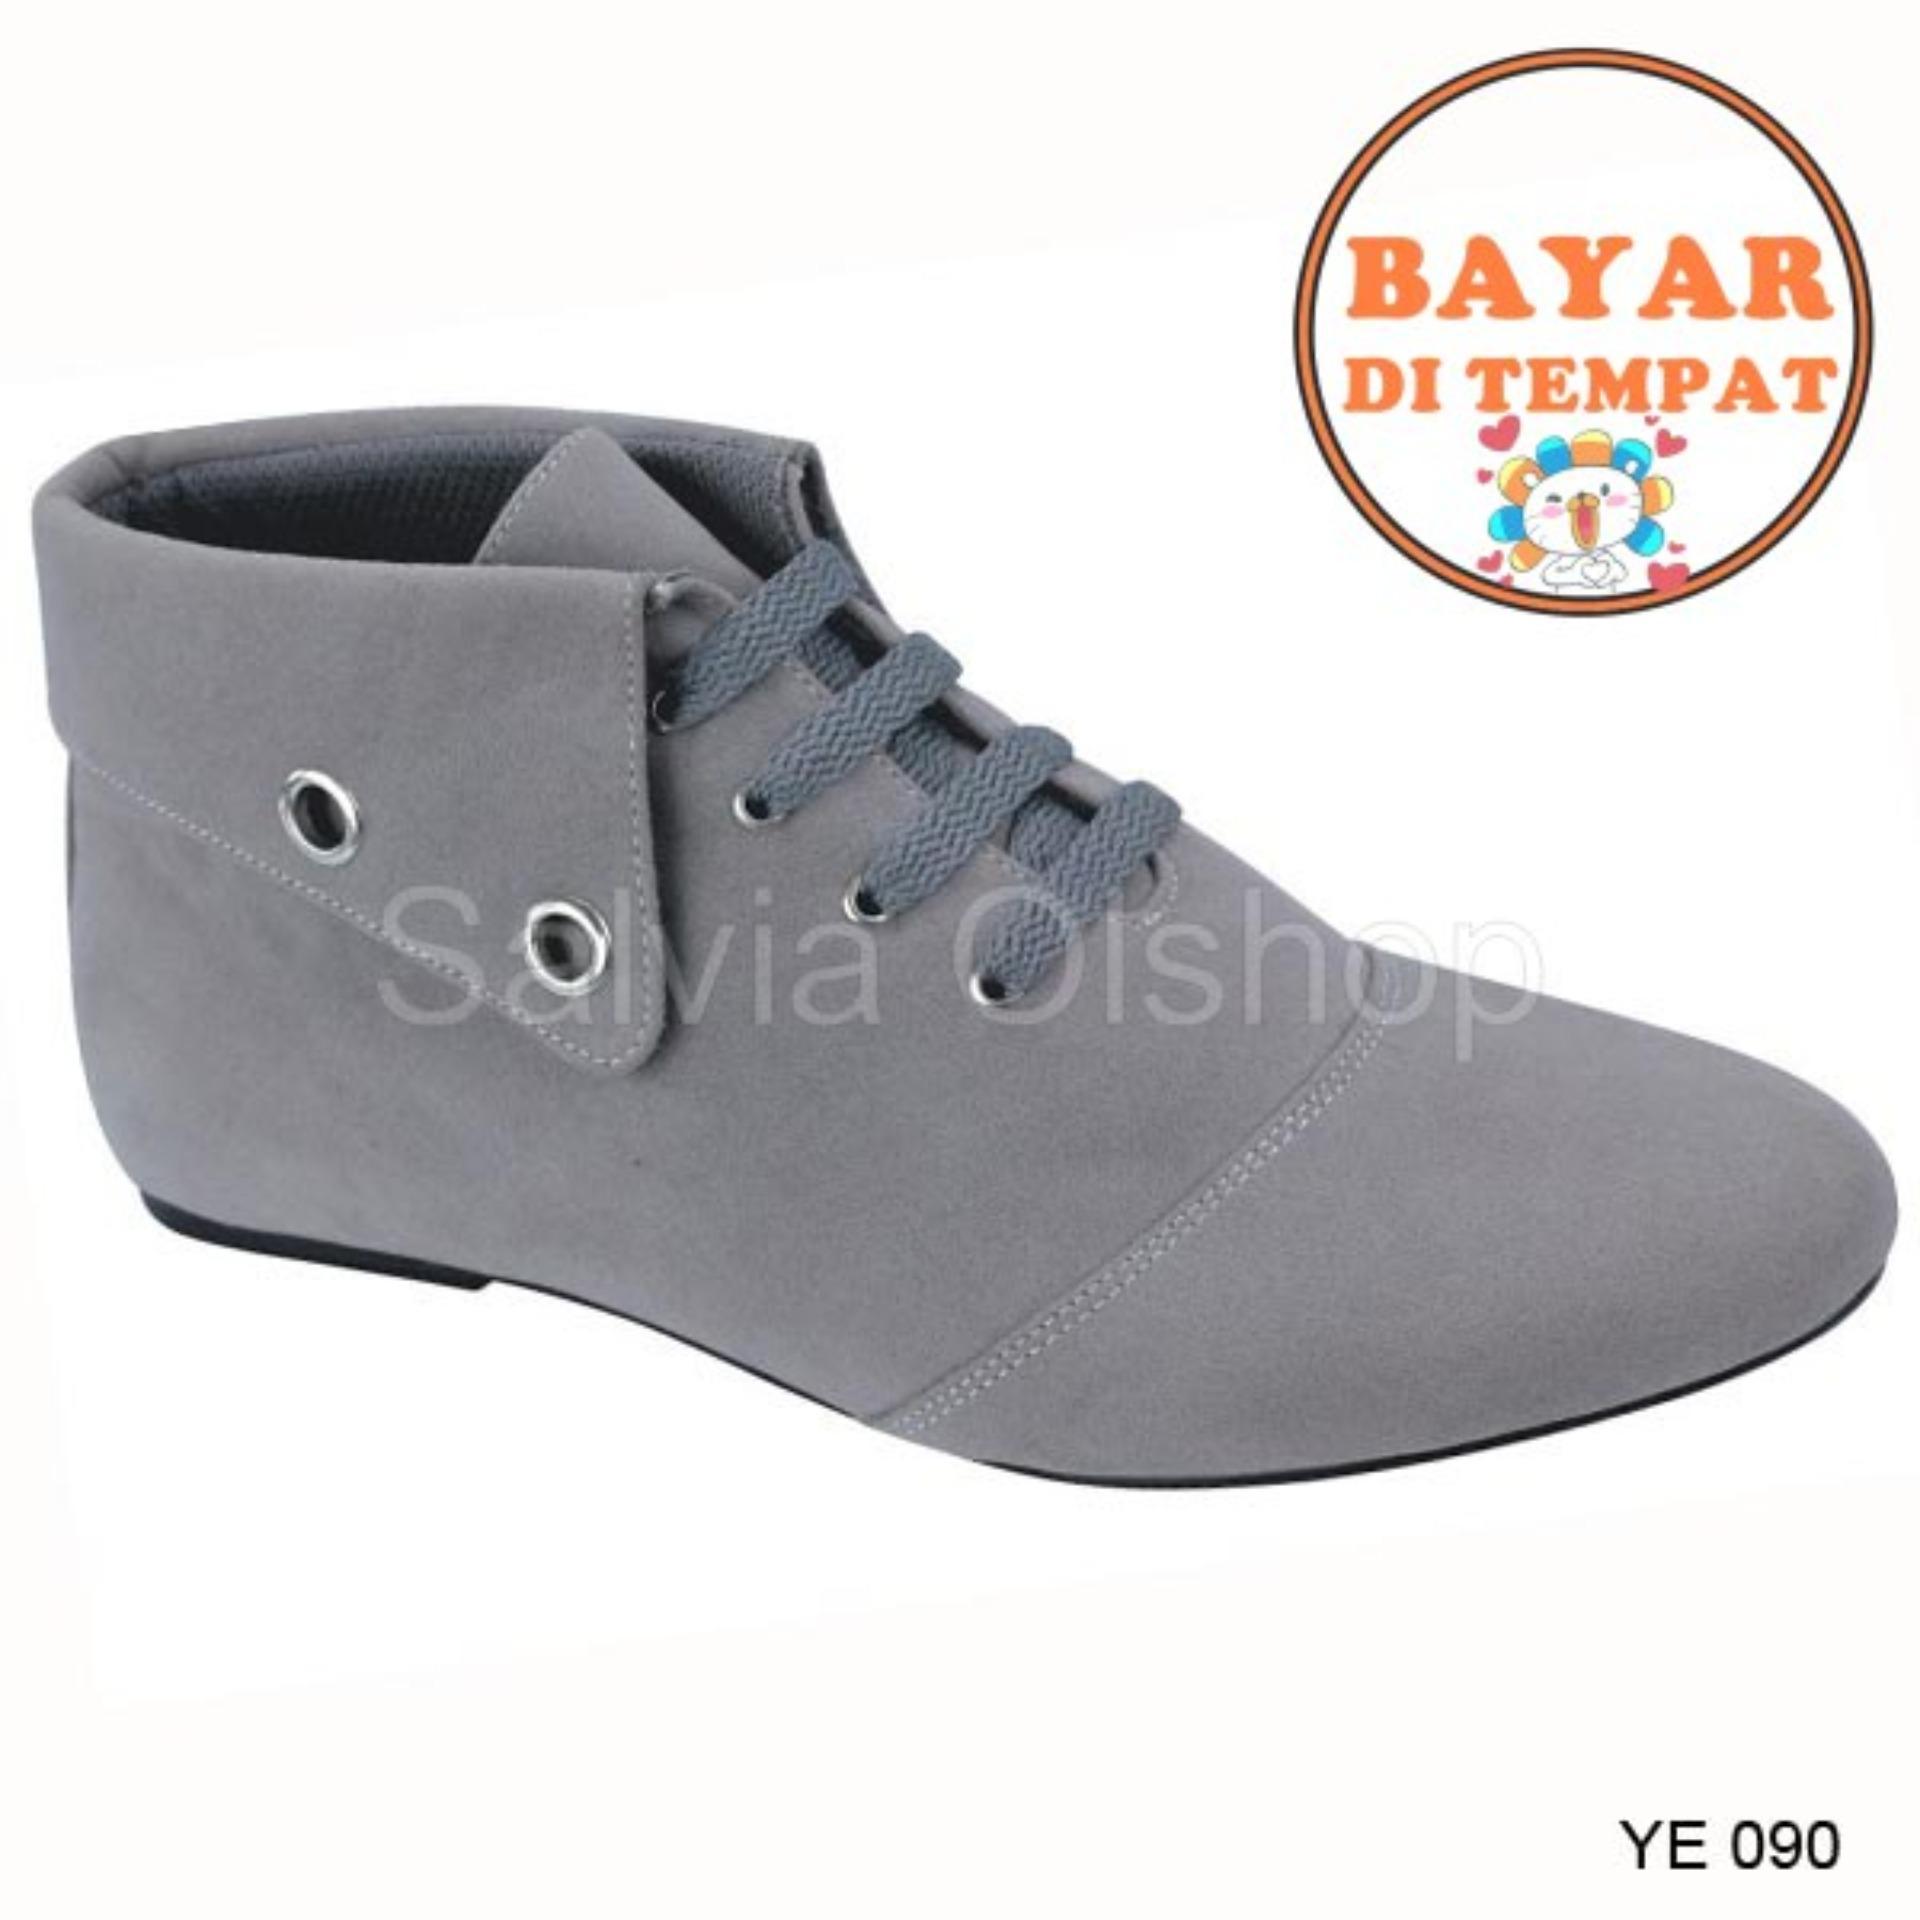 Catenzo Sepatu Boots Wanita Keren Dan Trendy YE 090 Abu